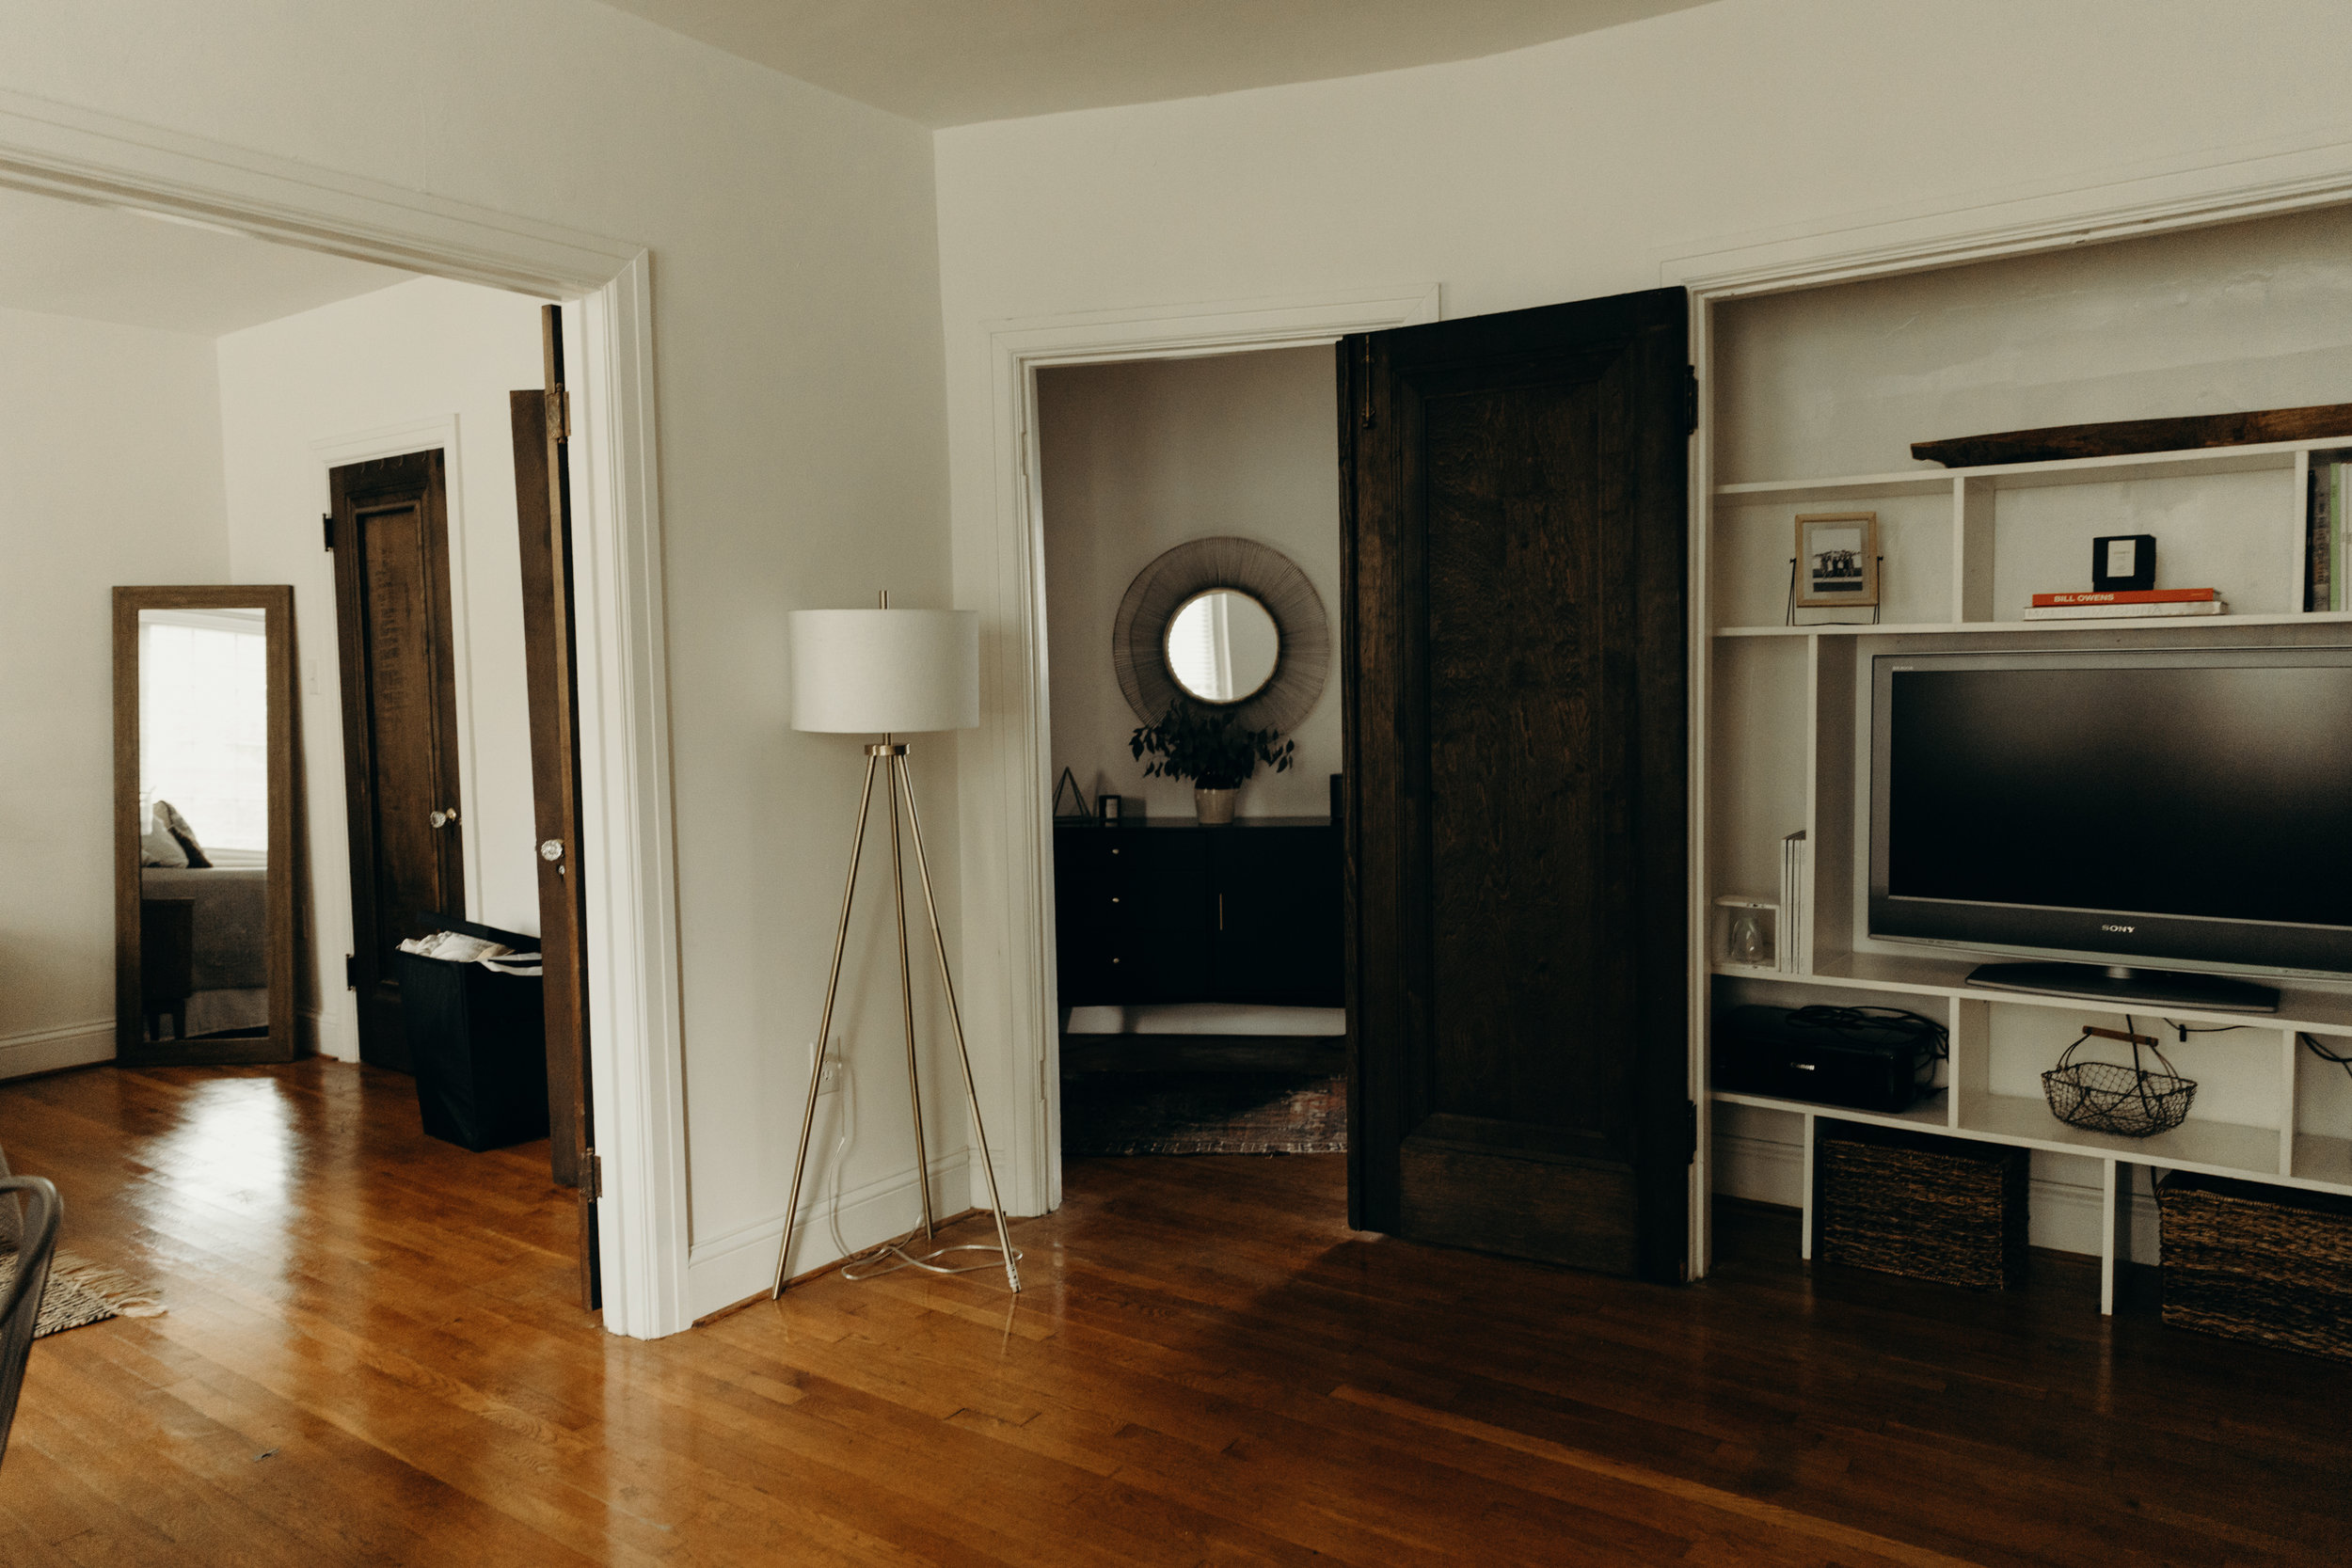 13-ltw-apartment-sterling-court.jpg